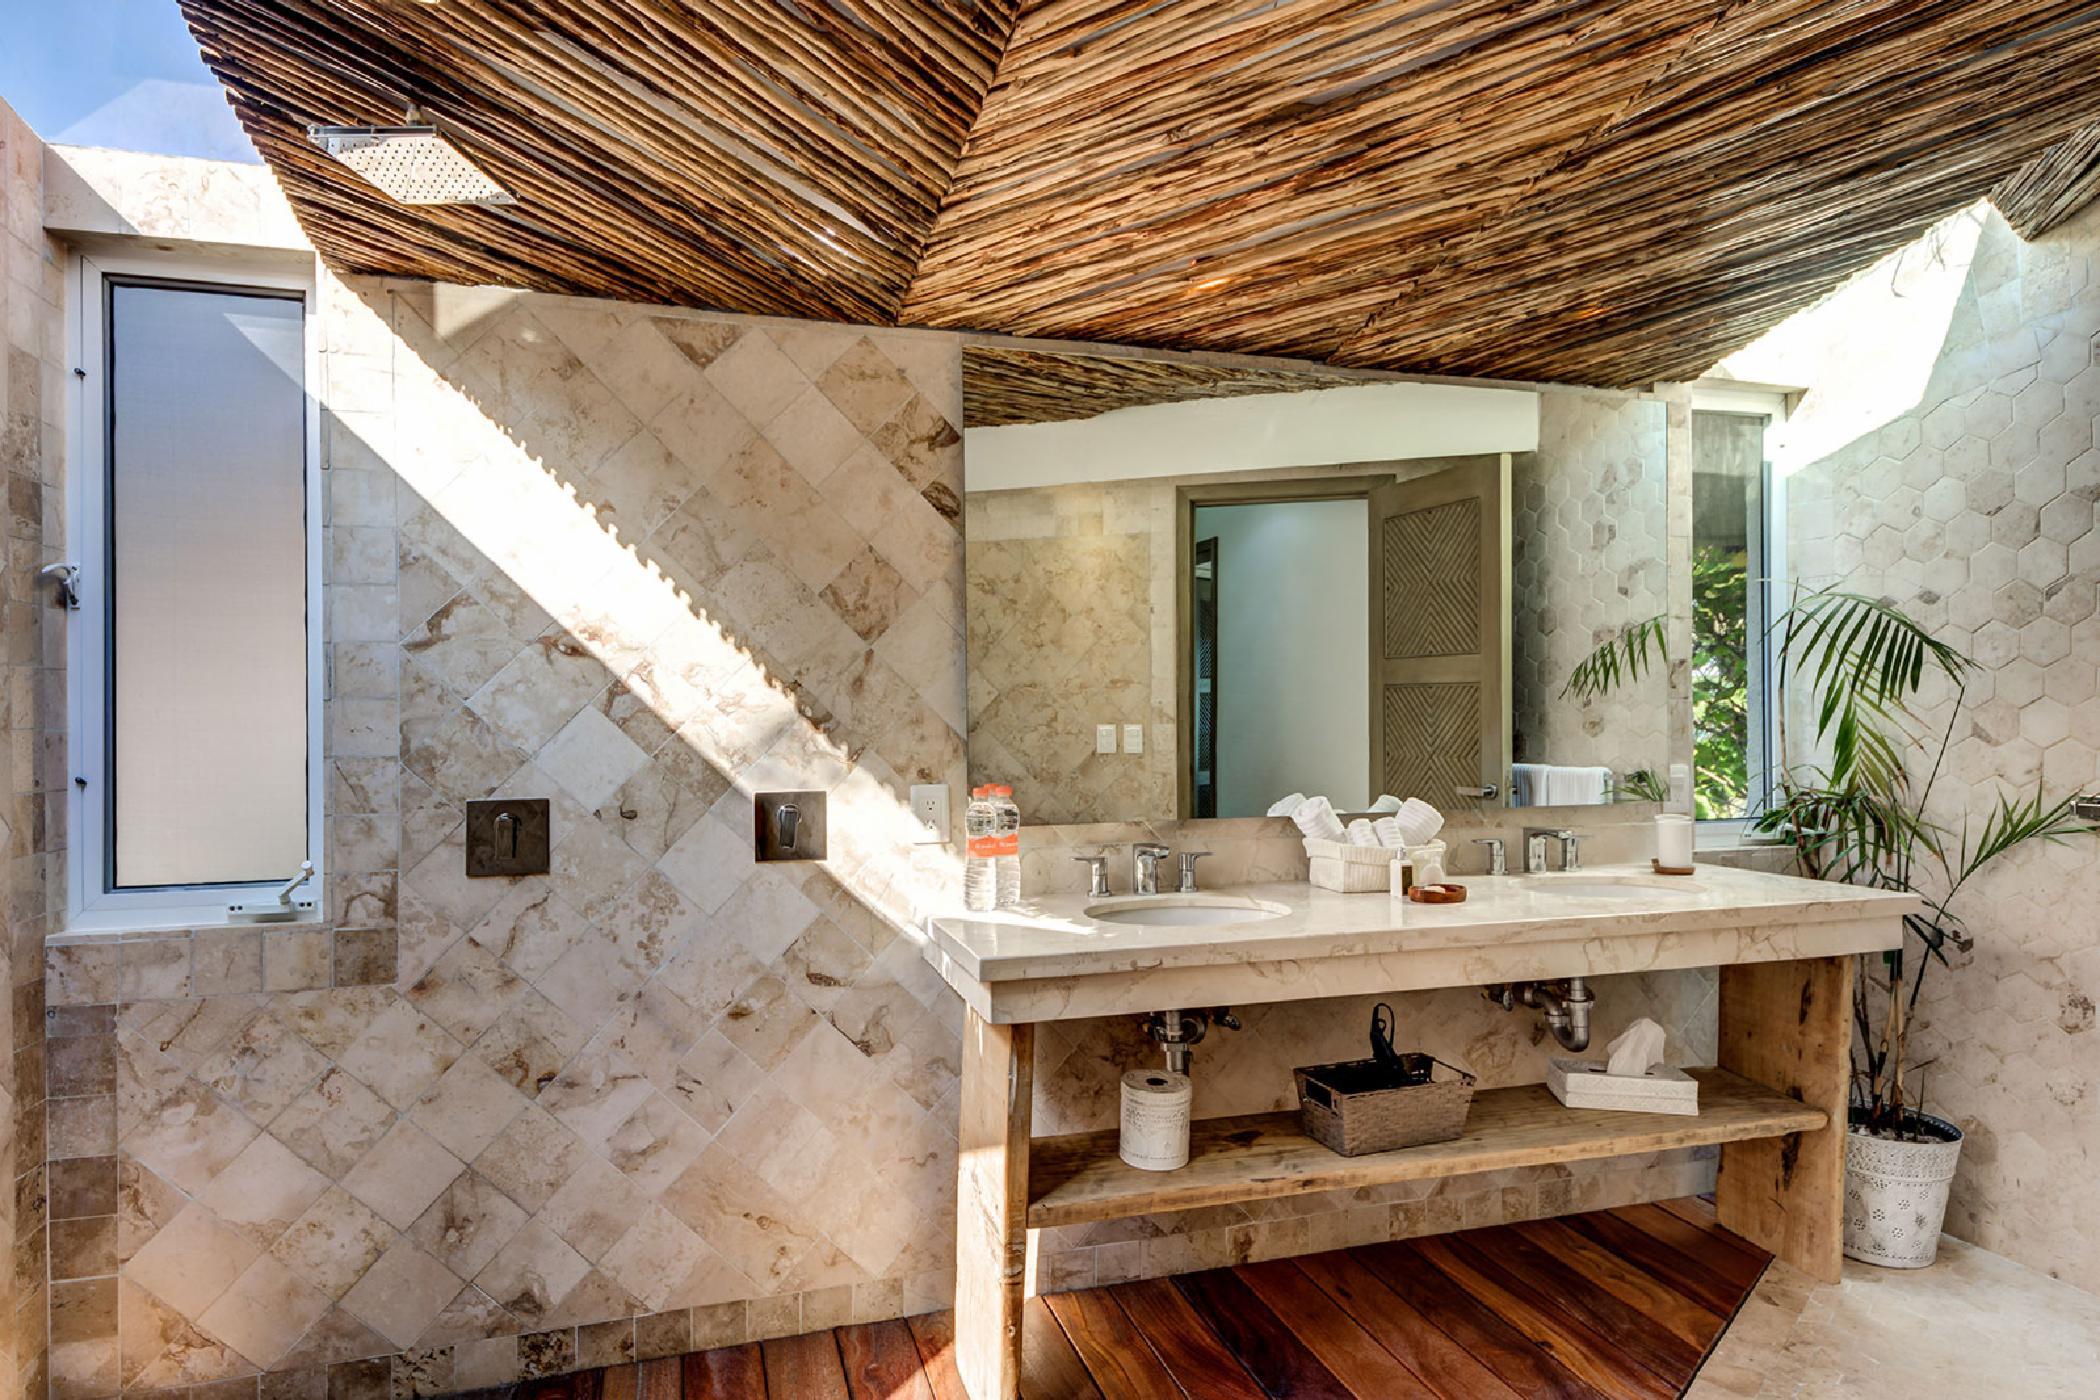 Maya_Luxe_Riviera_Maya_Luxury_Villas_Experiences_Puerto_Aventuras_5_Bedrooms_Zacil_Na_25.jpg